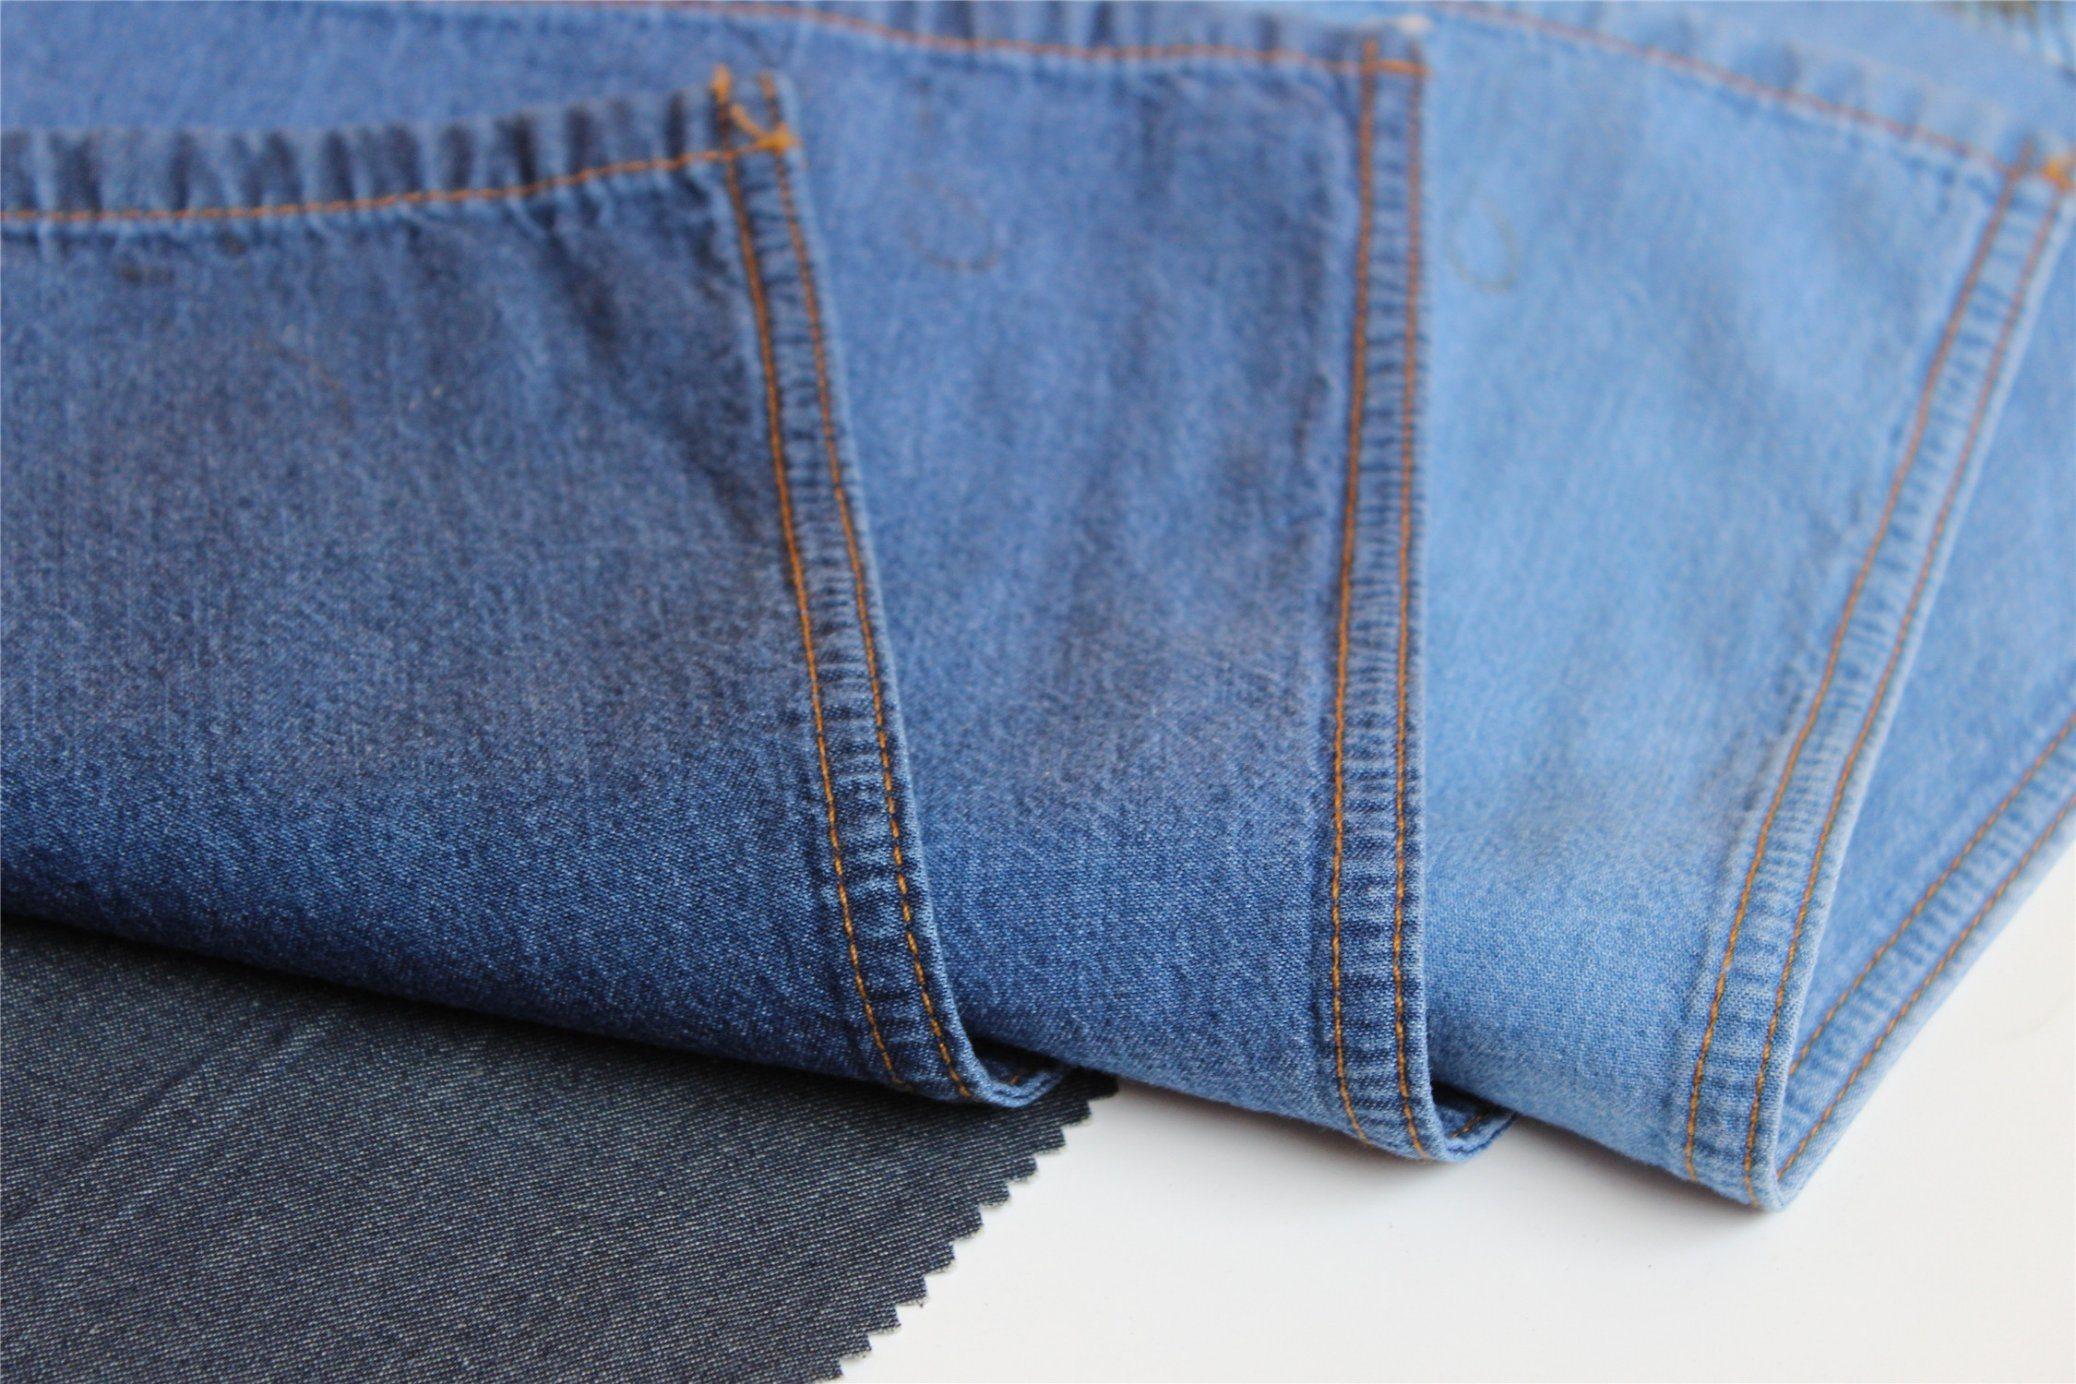 Tencel Cotton Denim Twill Indigo Denim For T-Shirt and Blouse Garments